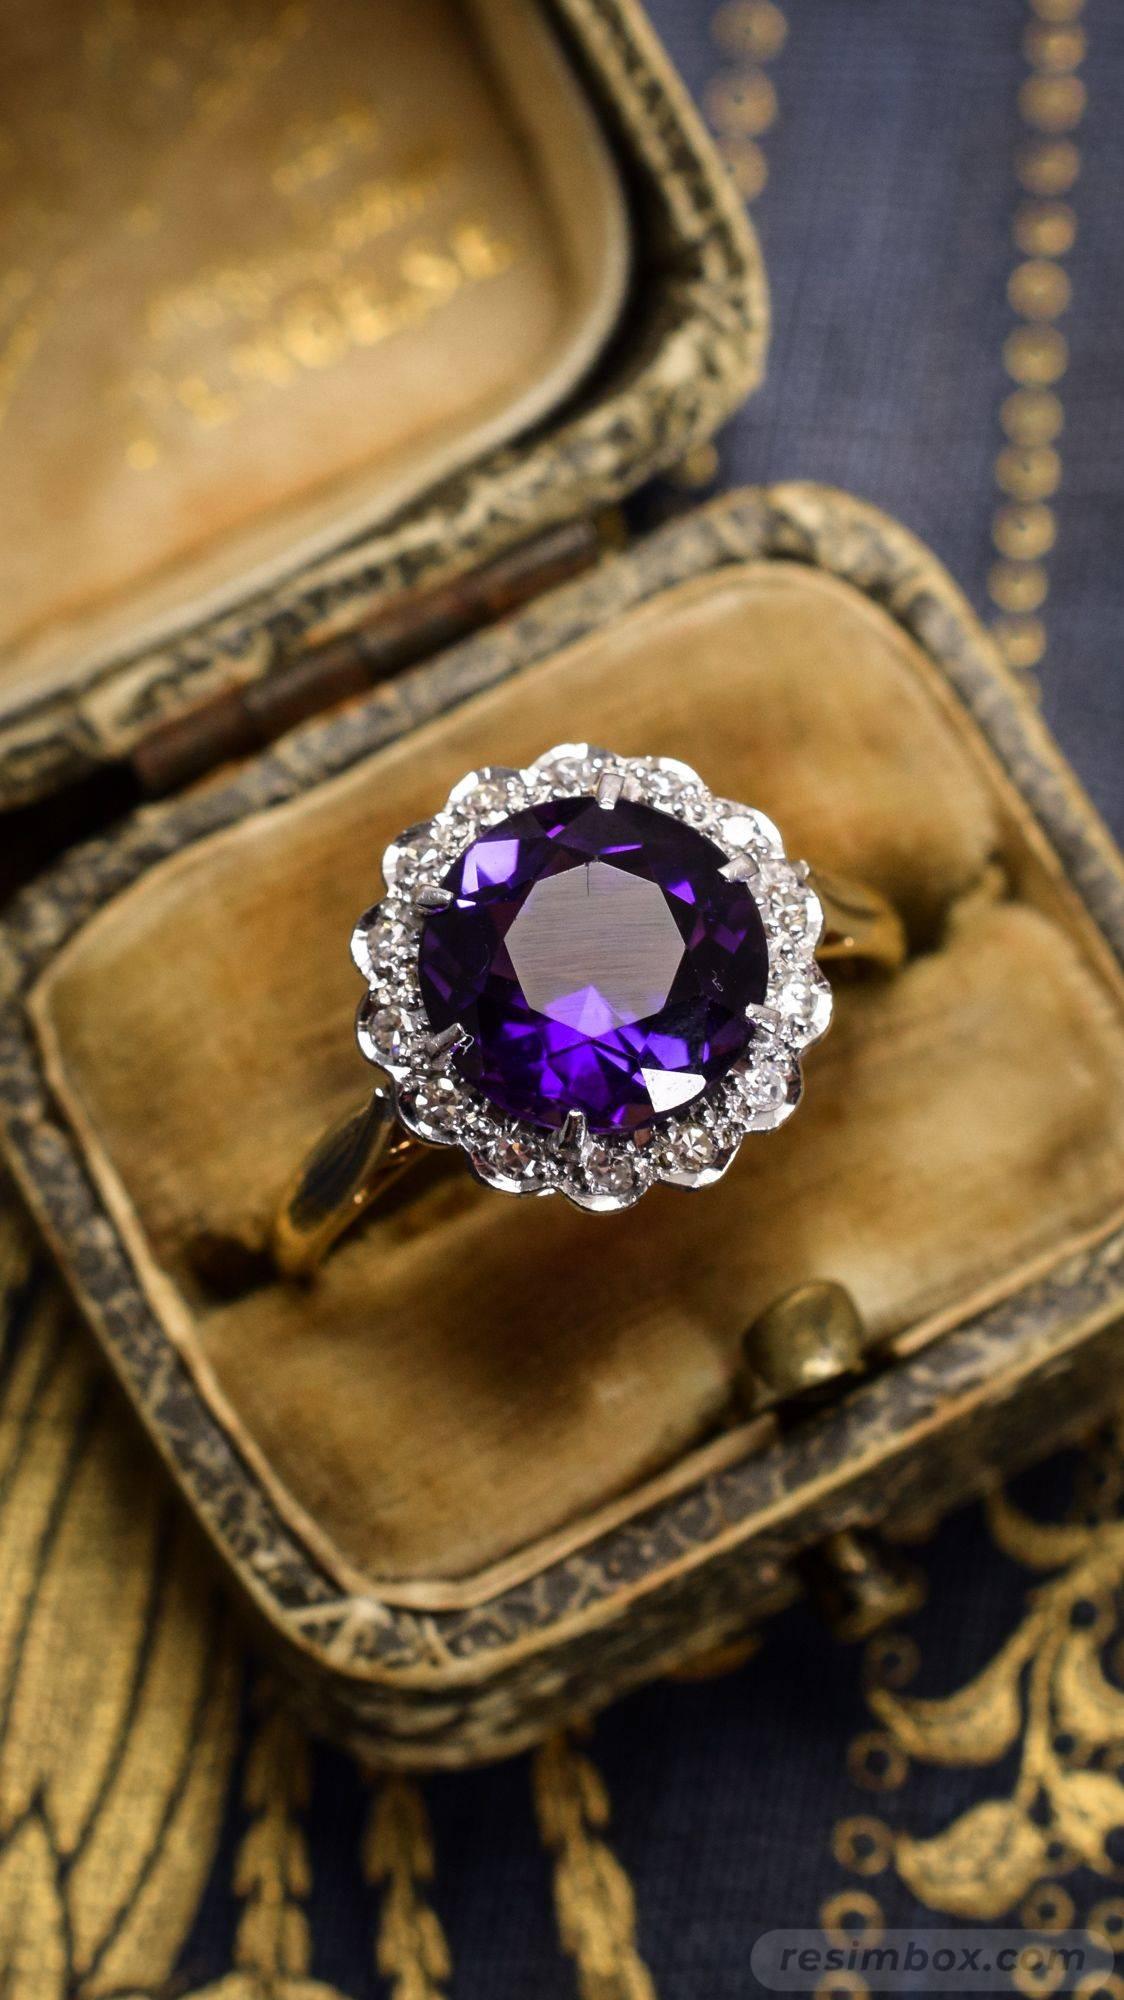 Art deco jewelry-414190496974014856